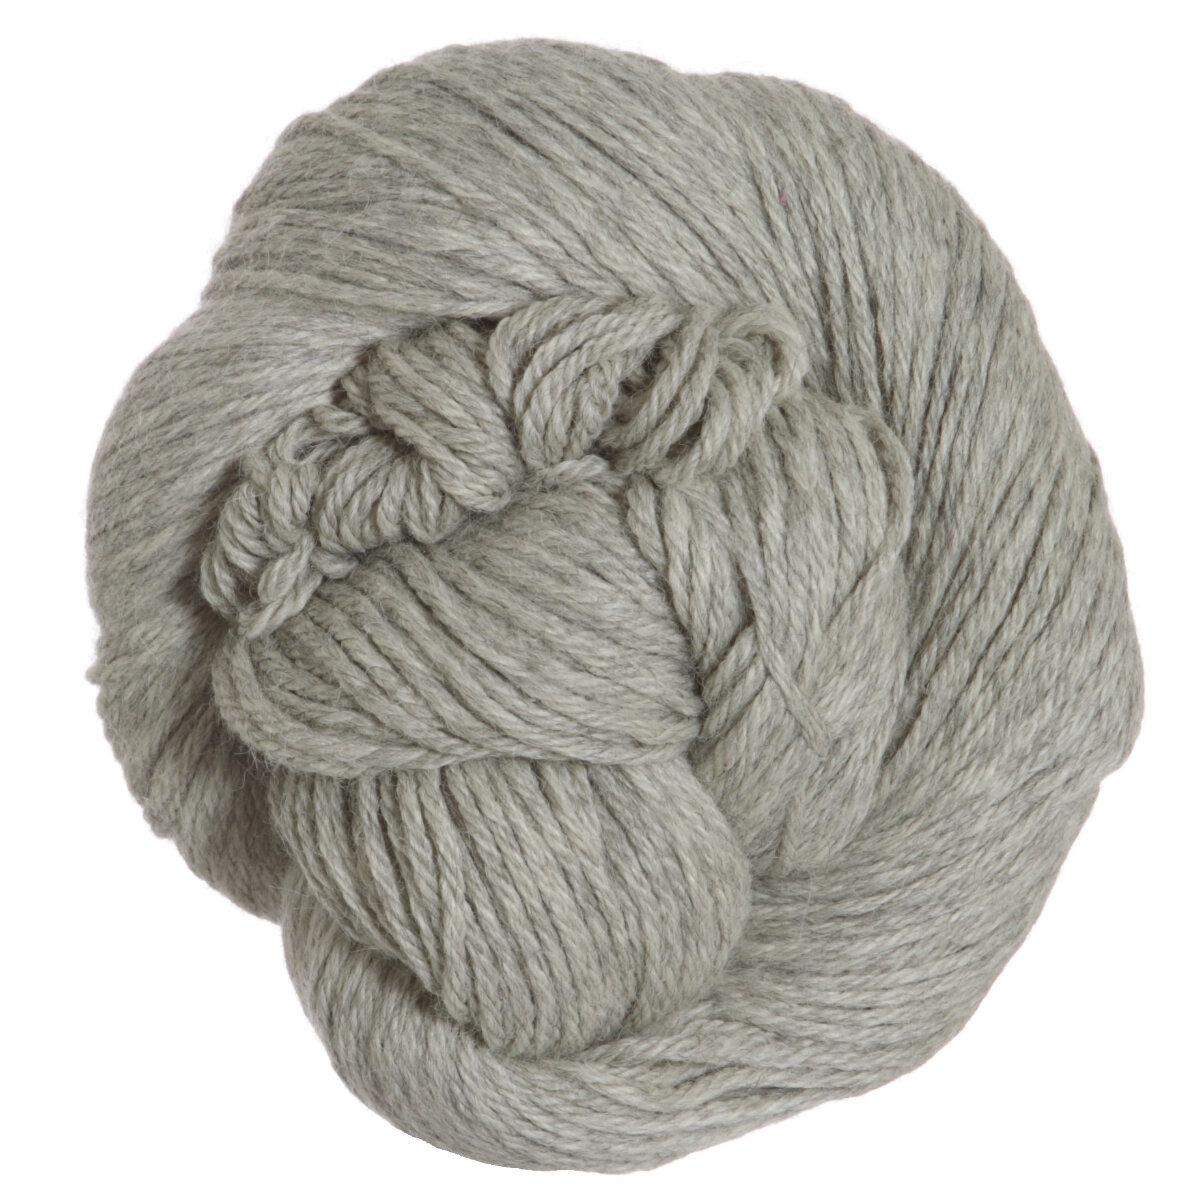 3e2d2b8fda24f Cascade Eco Alpaca Yarn - 1524 Oatmeal at Jimmy Beans Wool